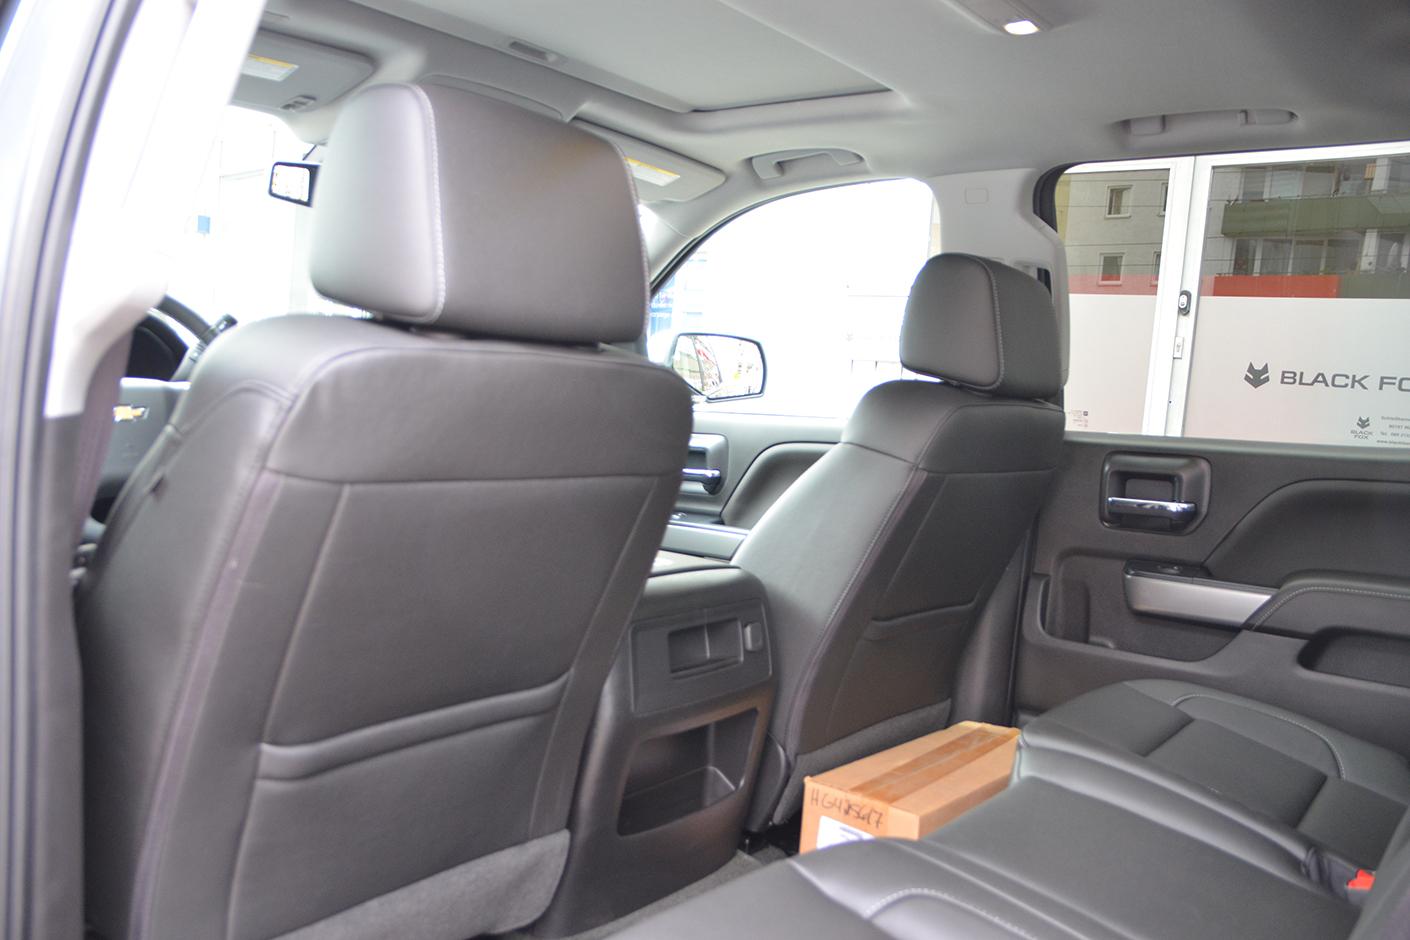 Chevrolet Silverado LTZ 2LZ Z71 2018-8